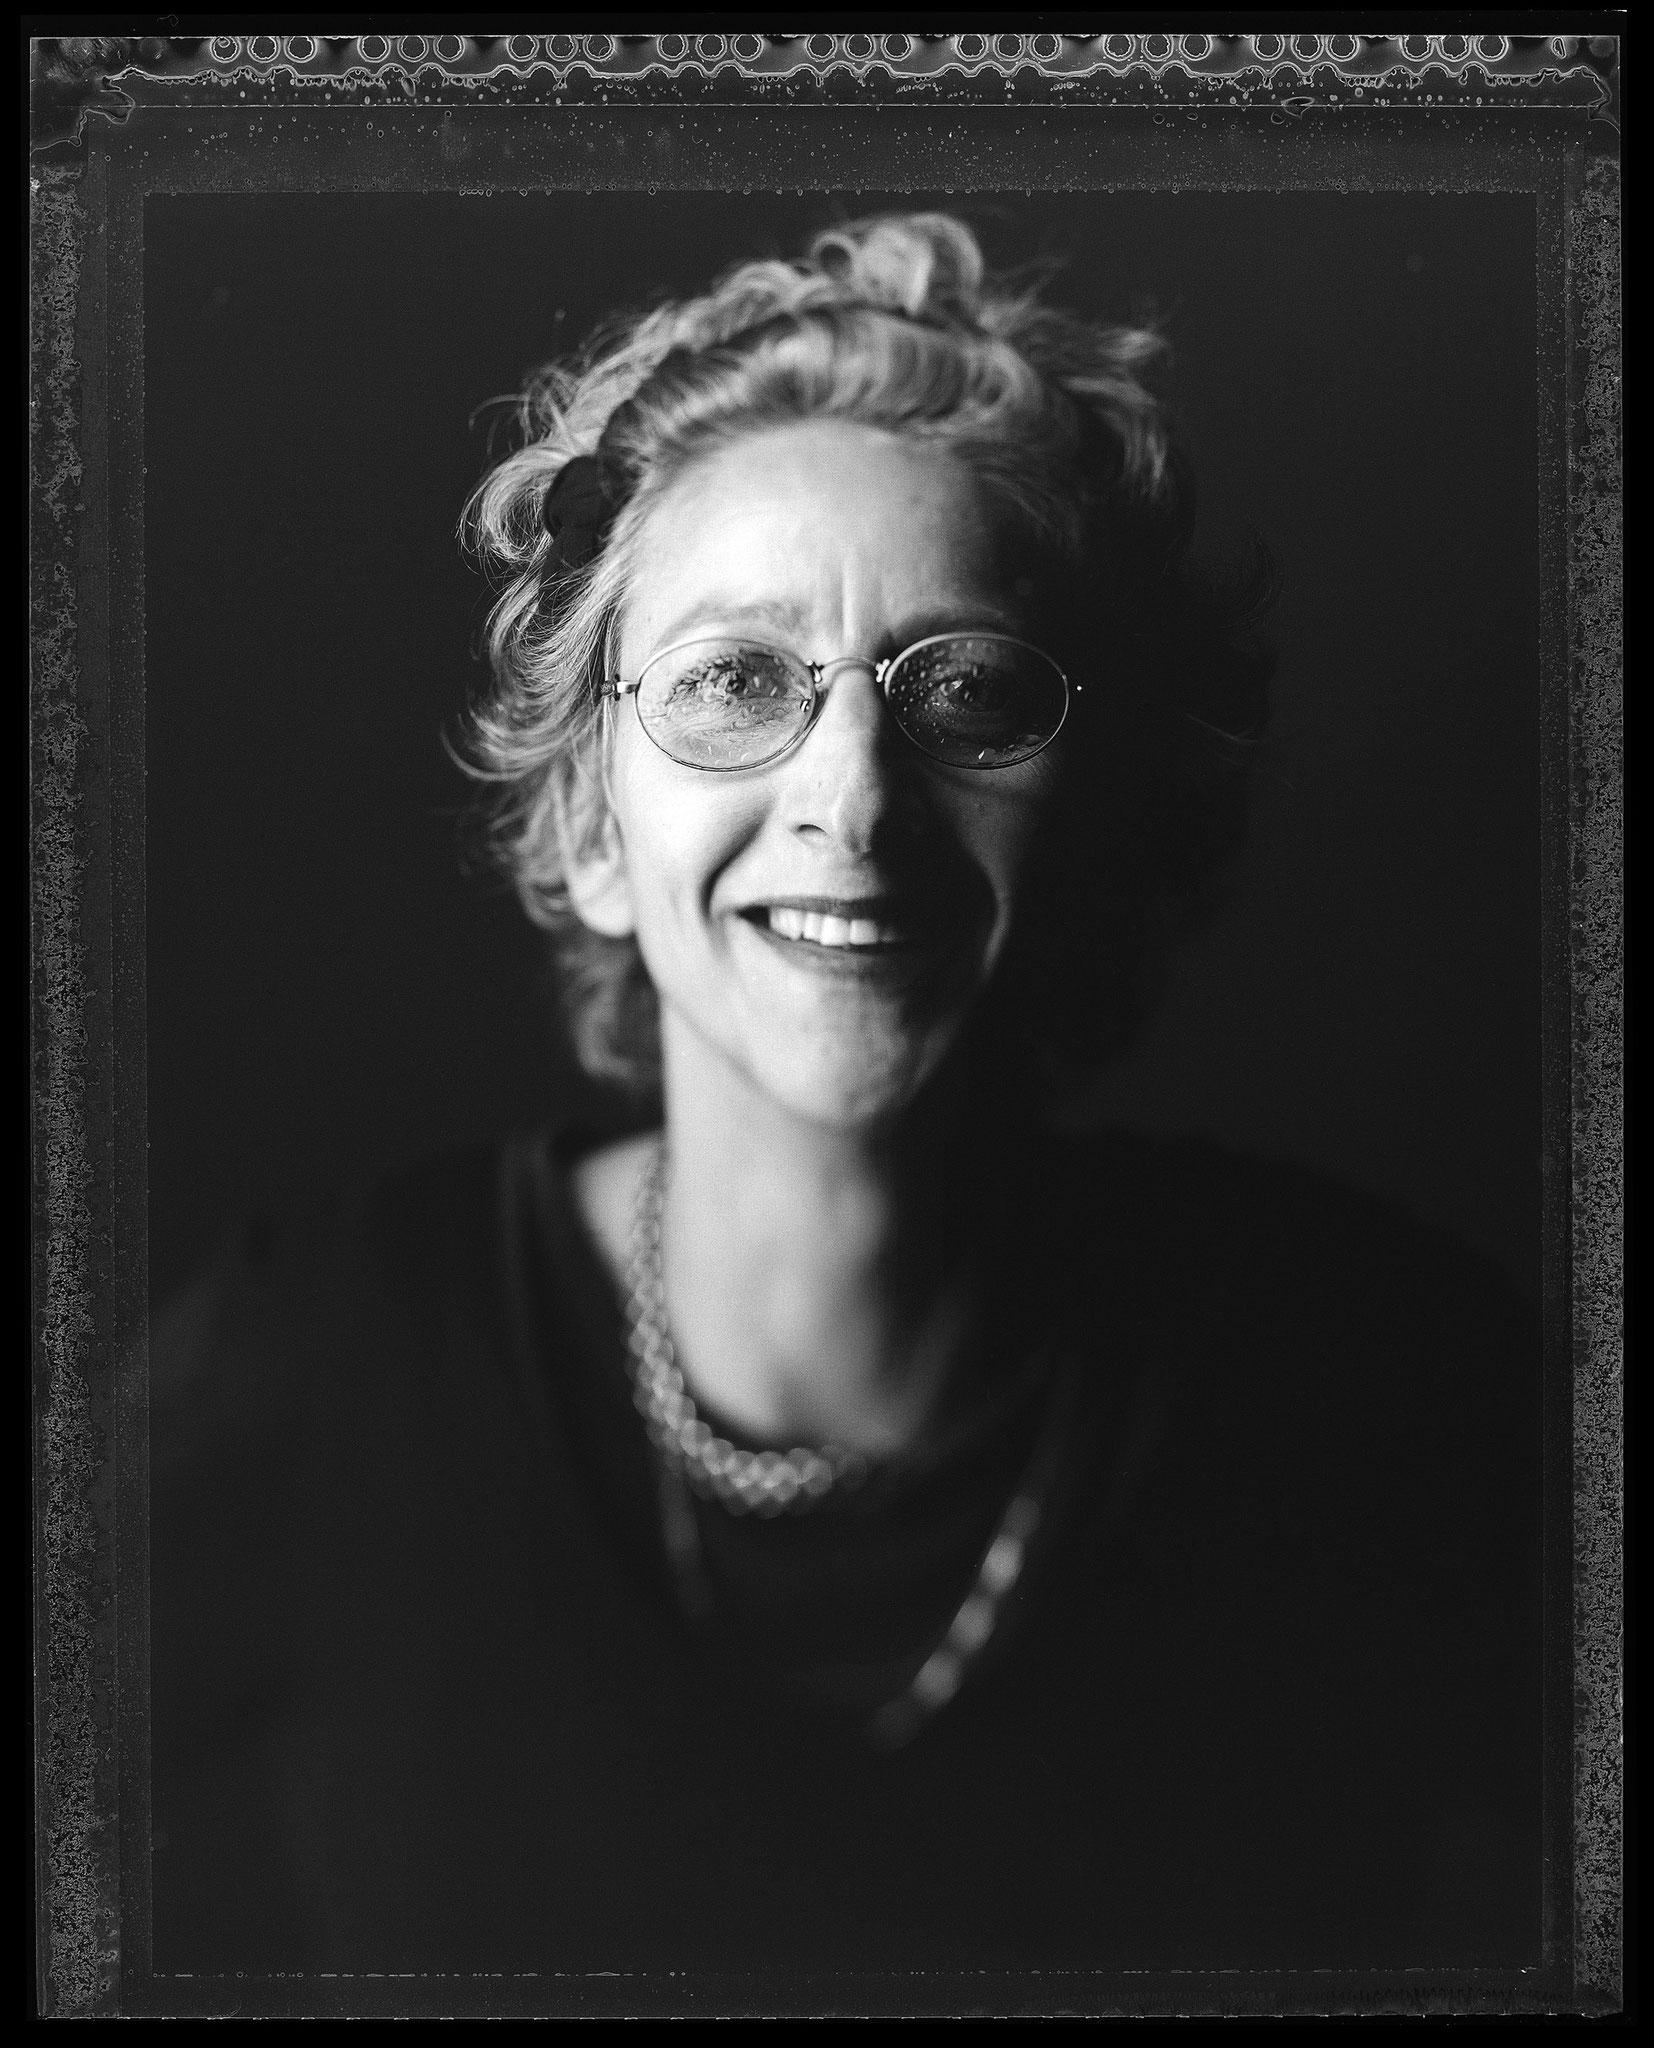 Tanja Hofmann 1950 - 2020